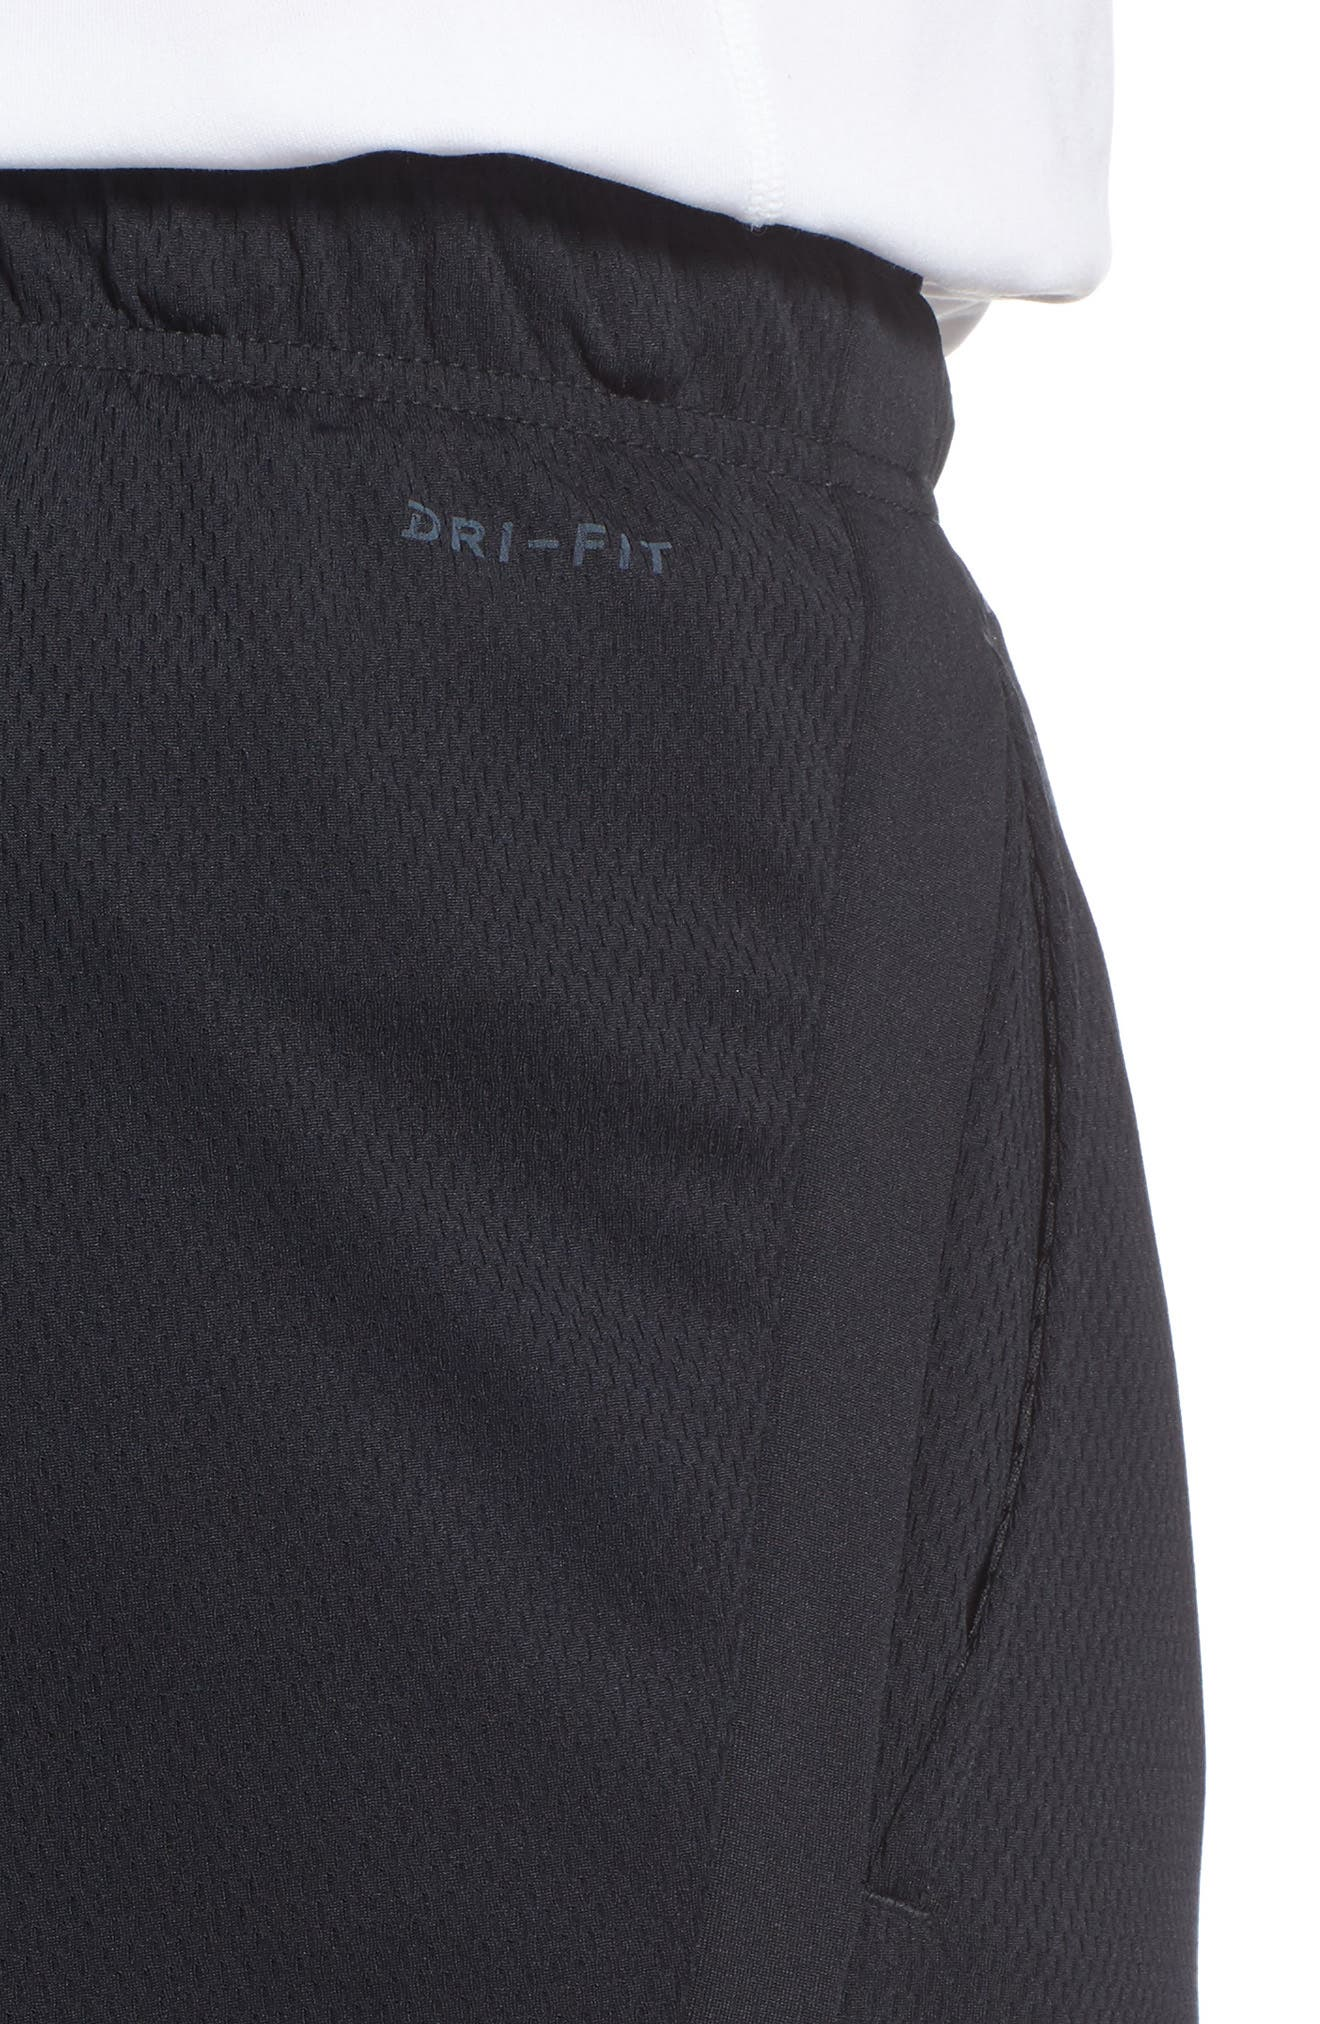 Training Dry 4.0 Shorts,                             Alternate thumbnail 4, color,                             010